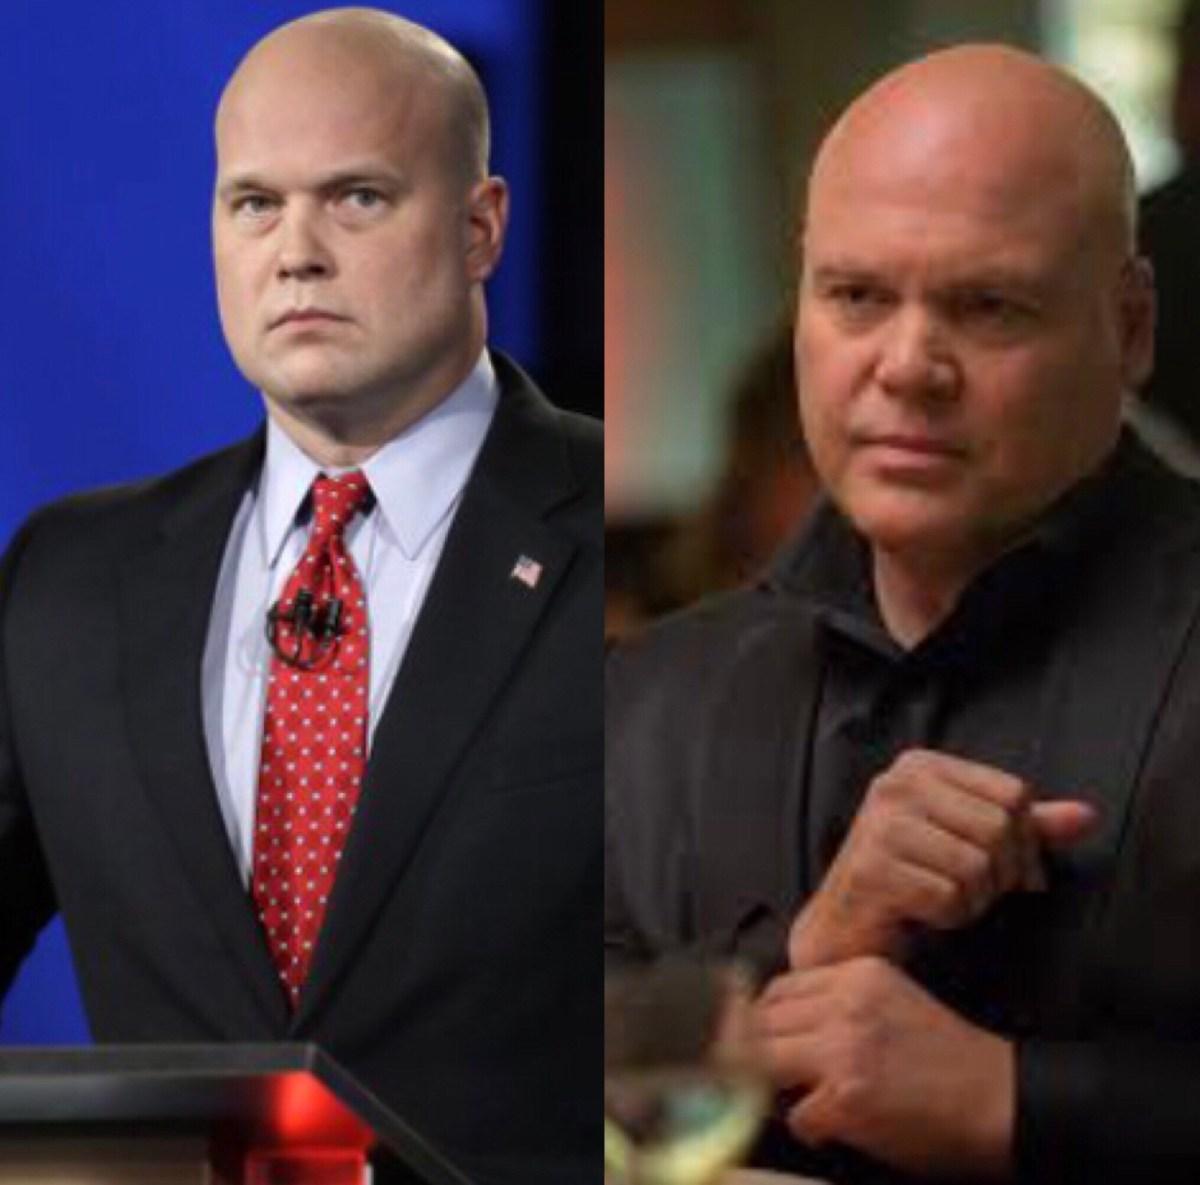 Matt Whitaker and Daredevil's Kingpin, separated at birth?